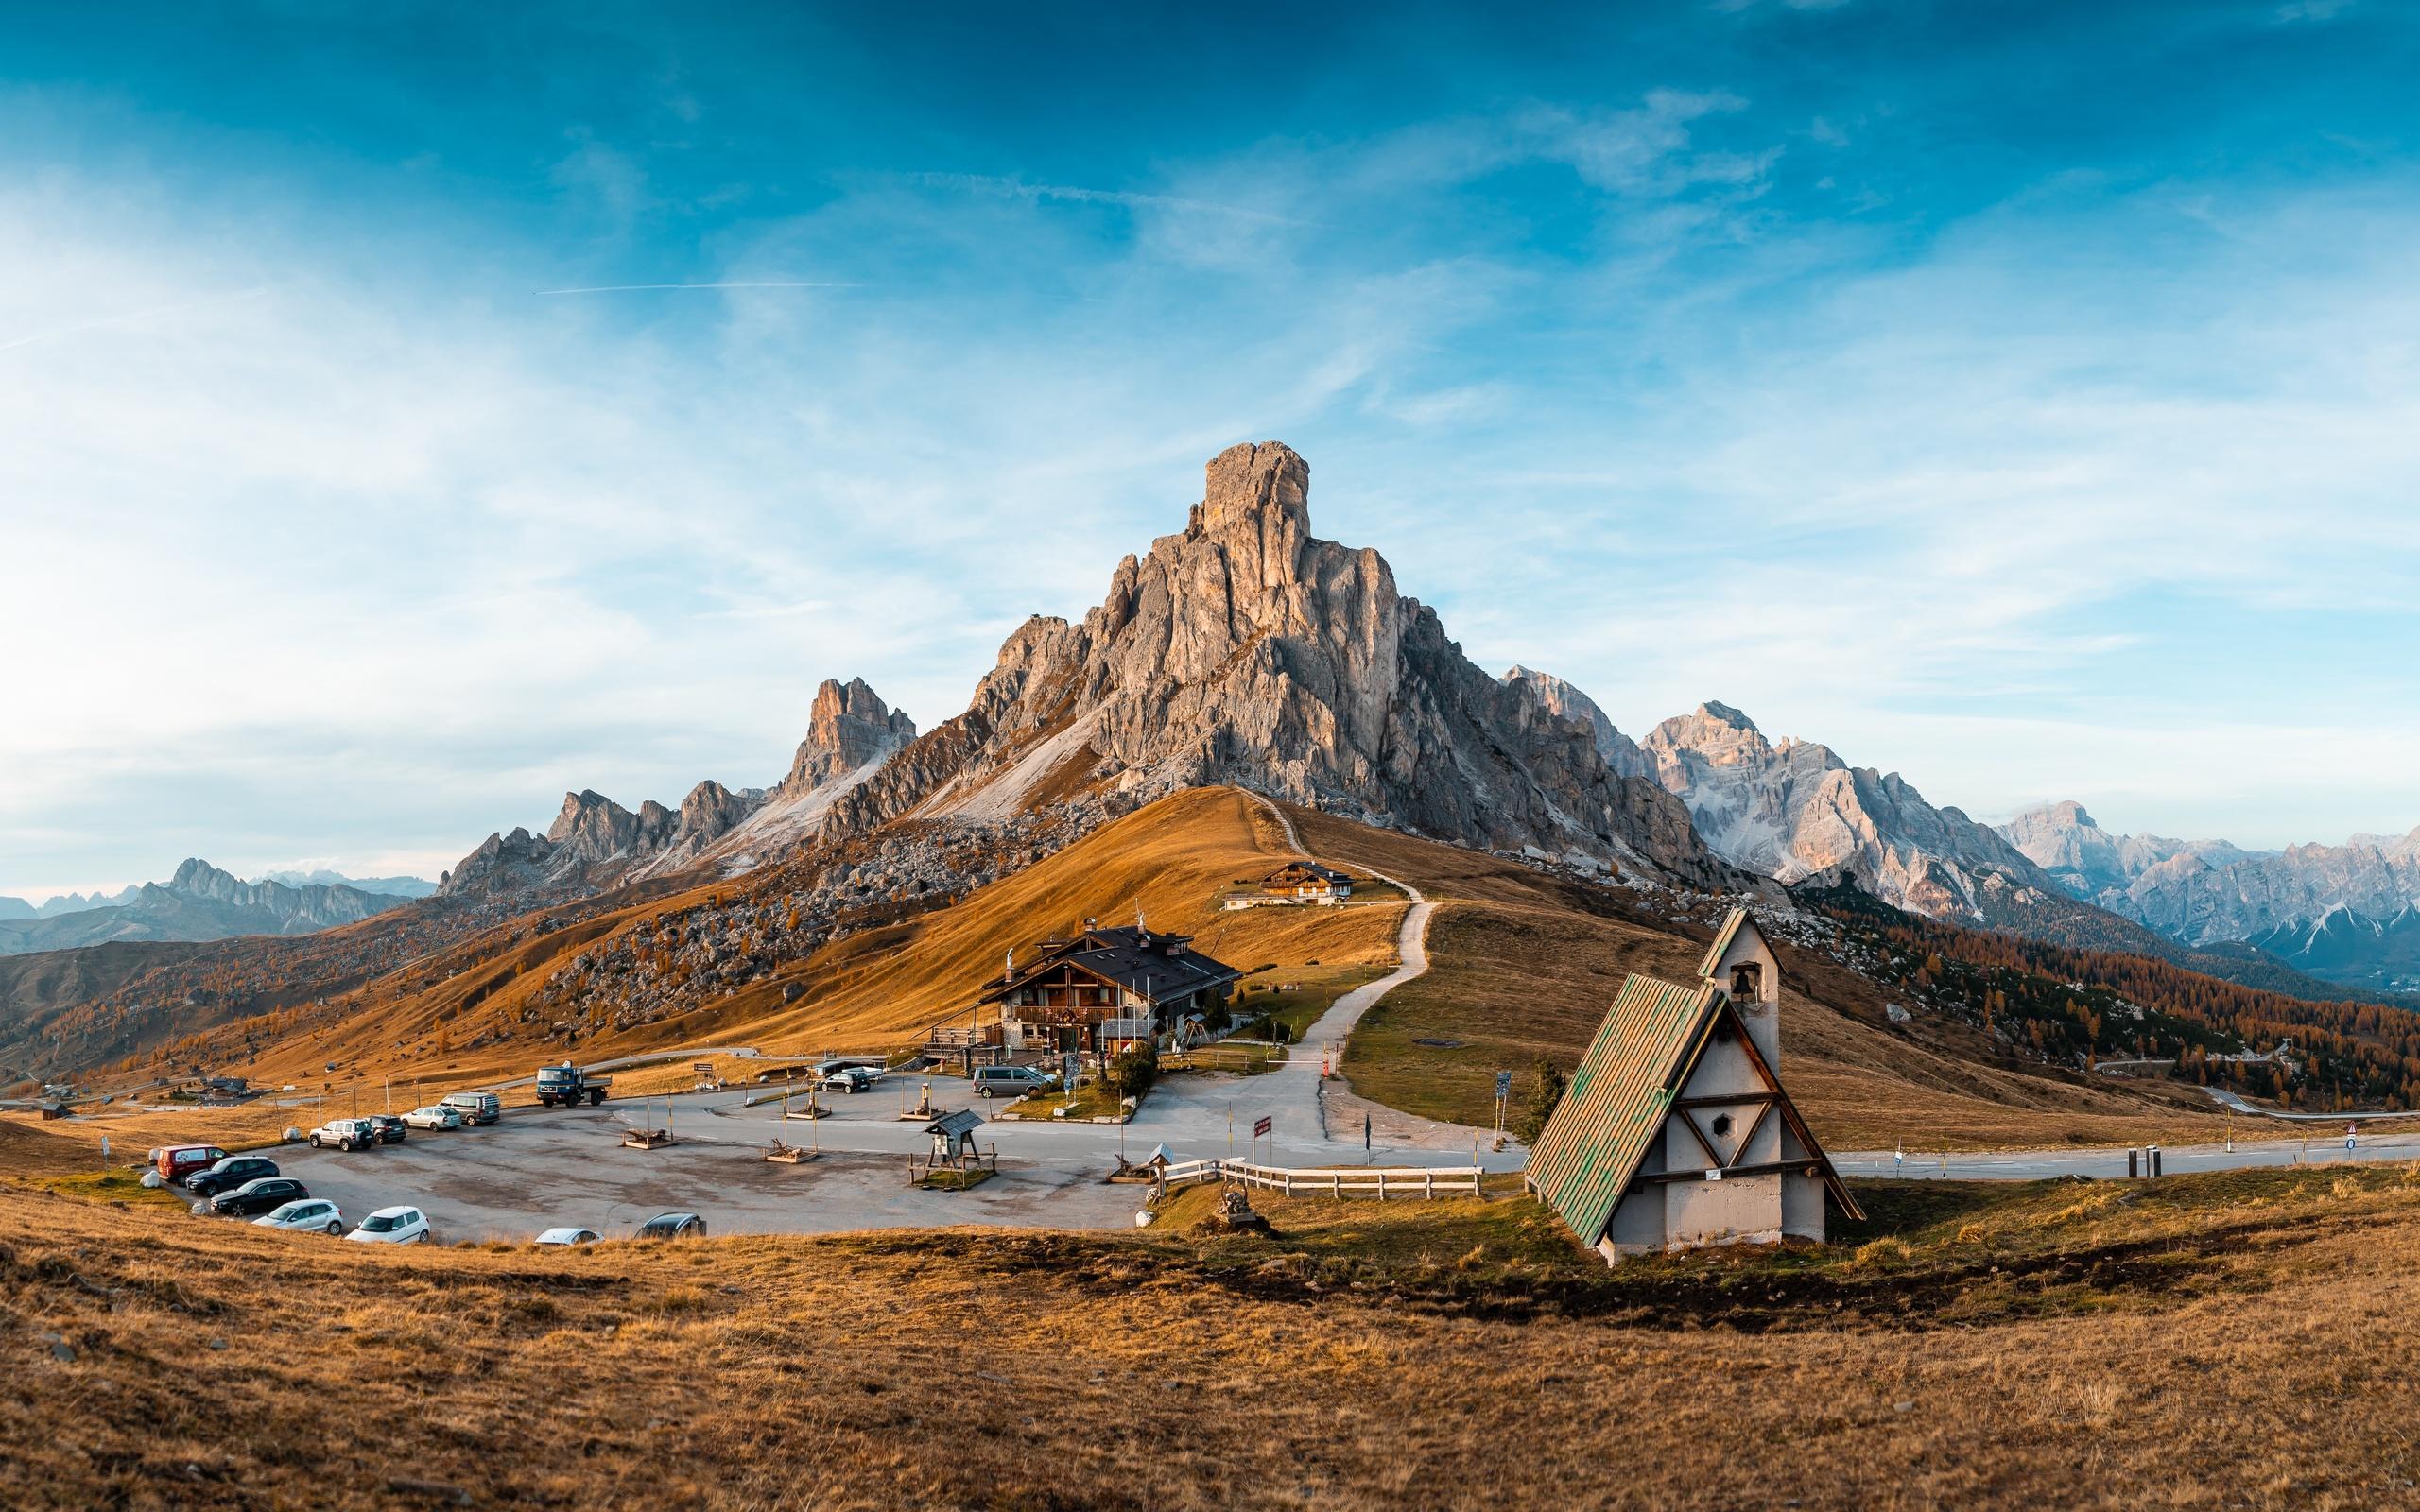 горы, италия, курорт, небо, пейзаж, cinque torri di averau, passo jau pass, природа